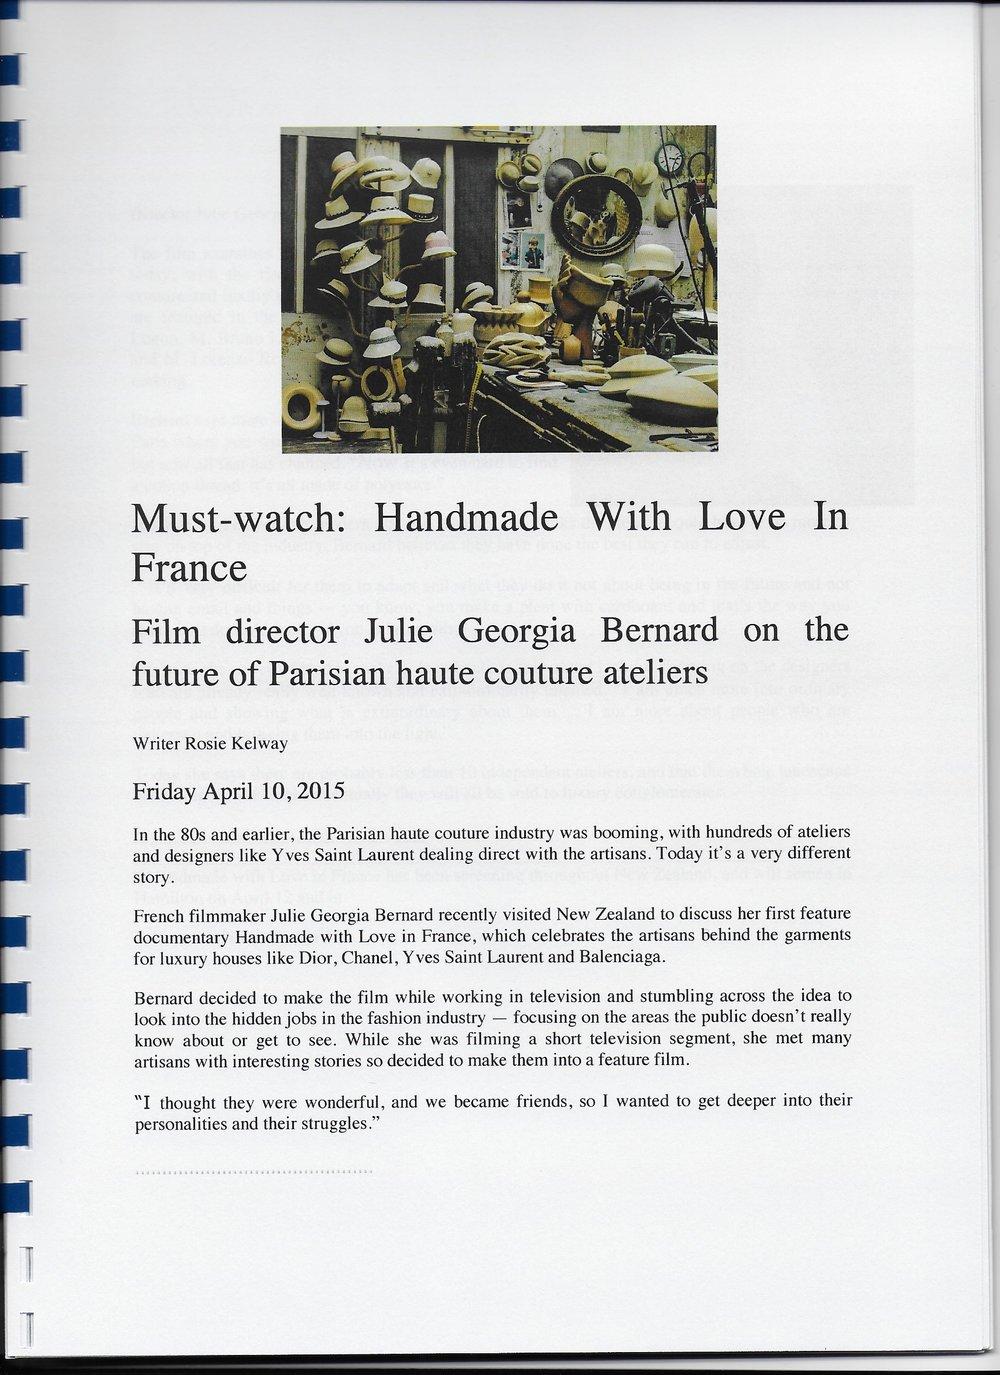 PRESS HAND MADE WITH LOVE 8.jpg